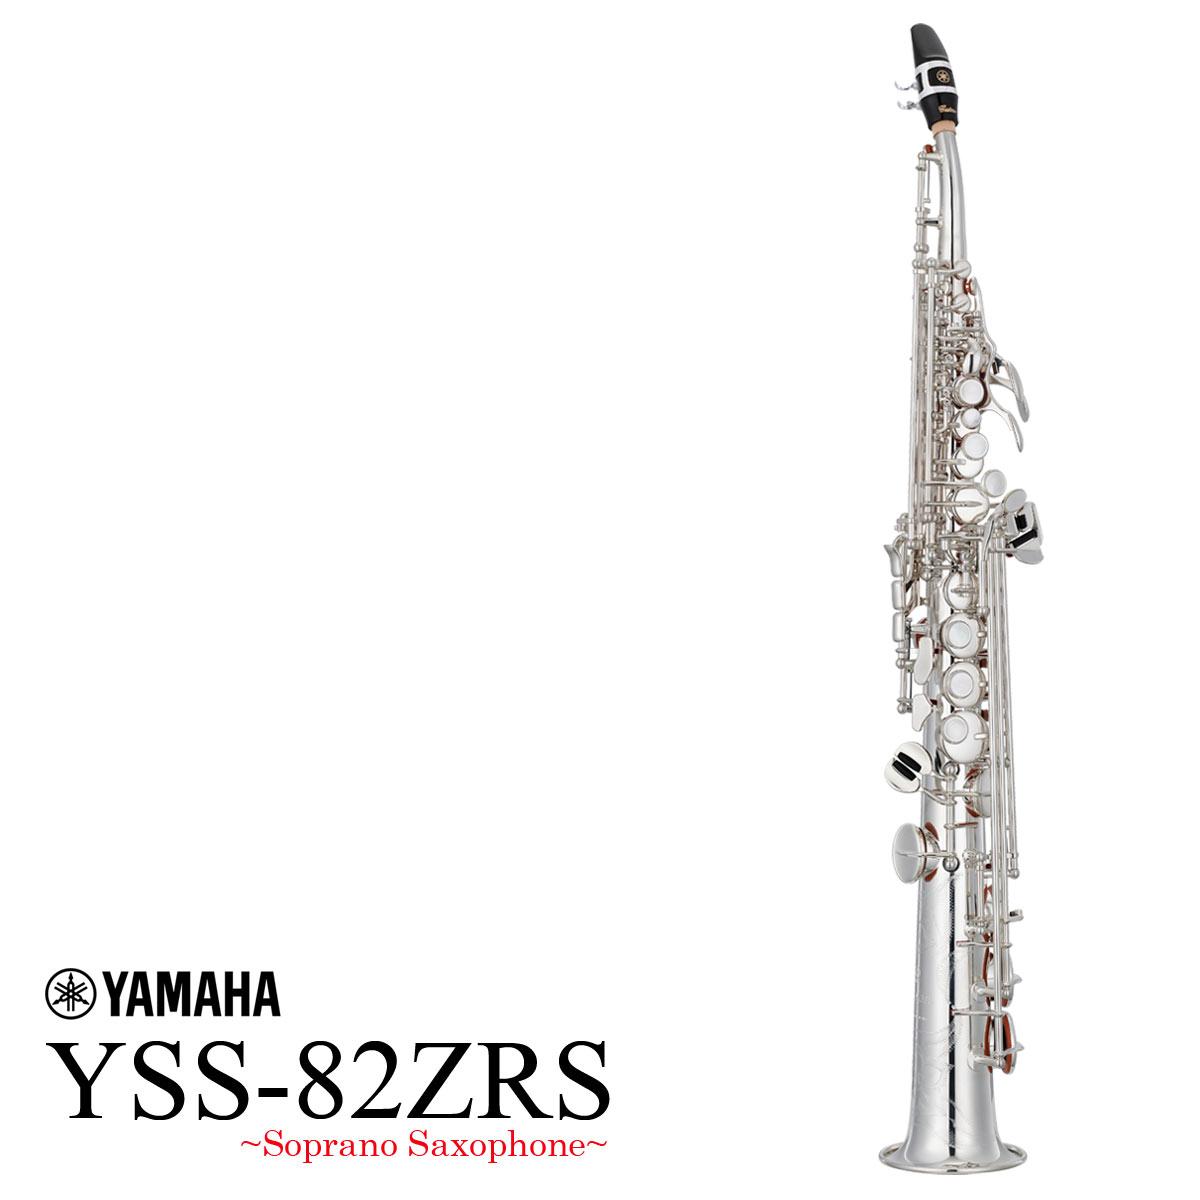 YAMAHA / YSS-82ZRS ヤマハ ソプラノサックス 銀メッキ カーブドネック 《受注生産品/納期約3~4ヶ月》《5年保証》【送料無料】